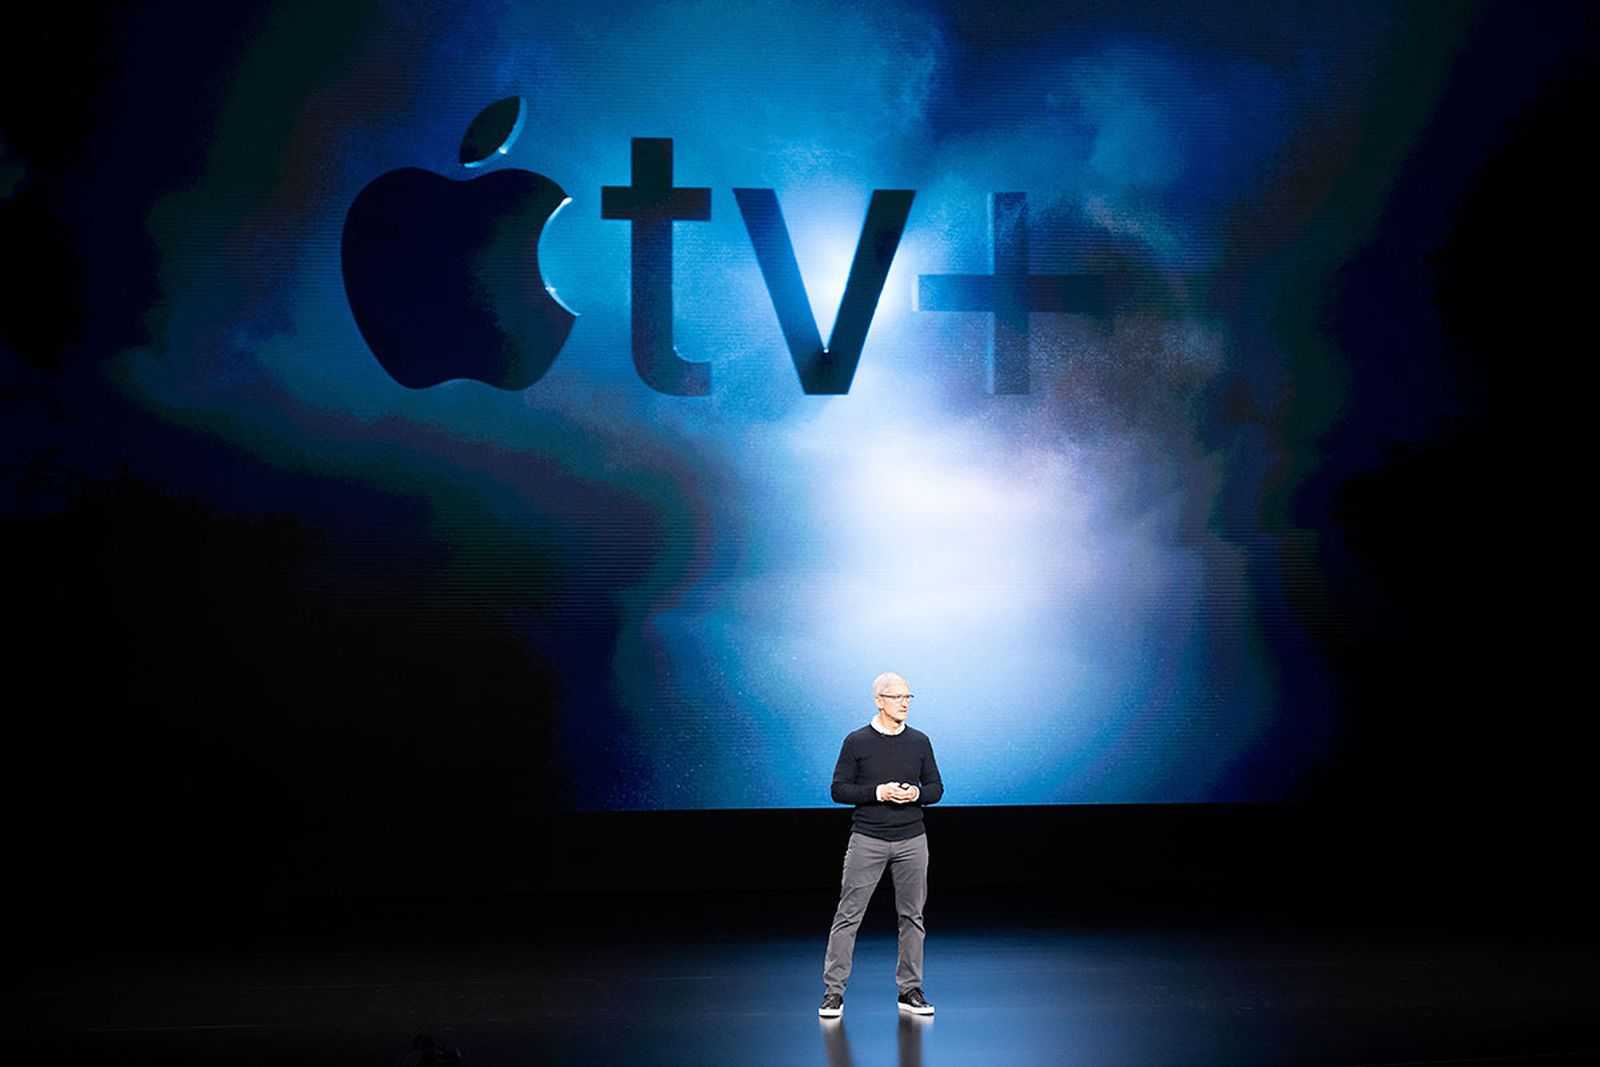 Tim Cook Apple TV+ background